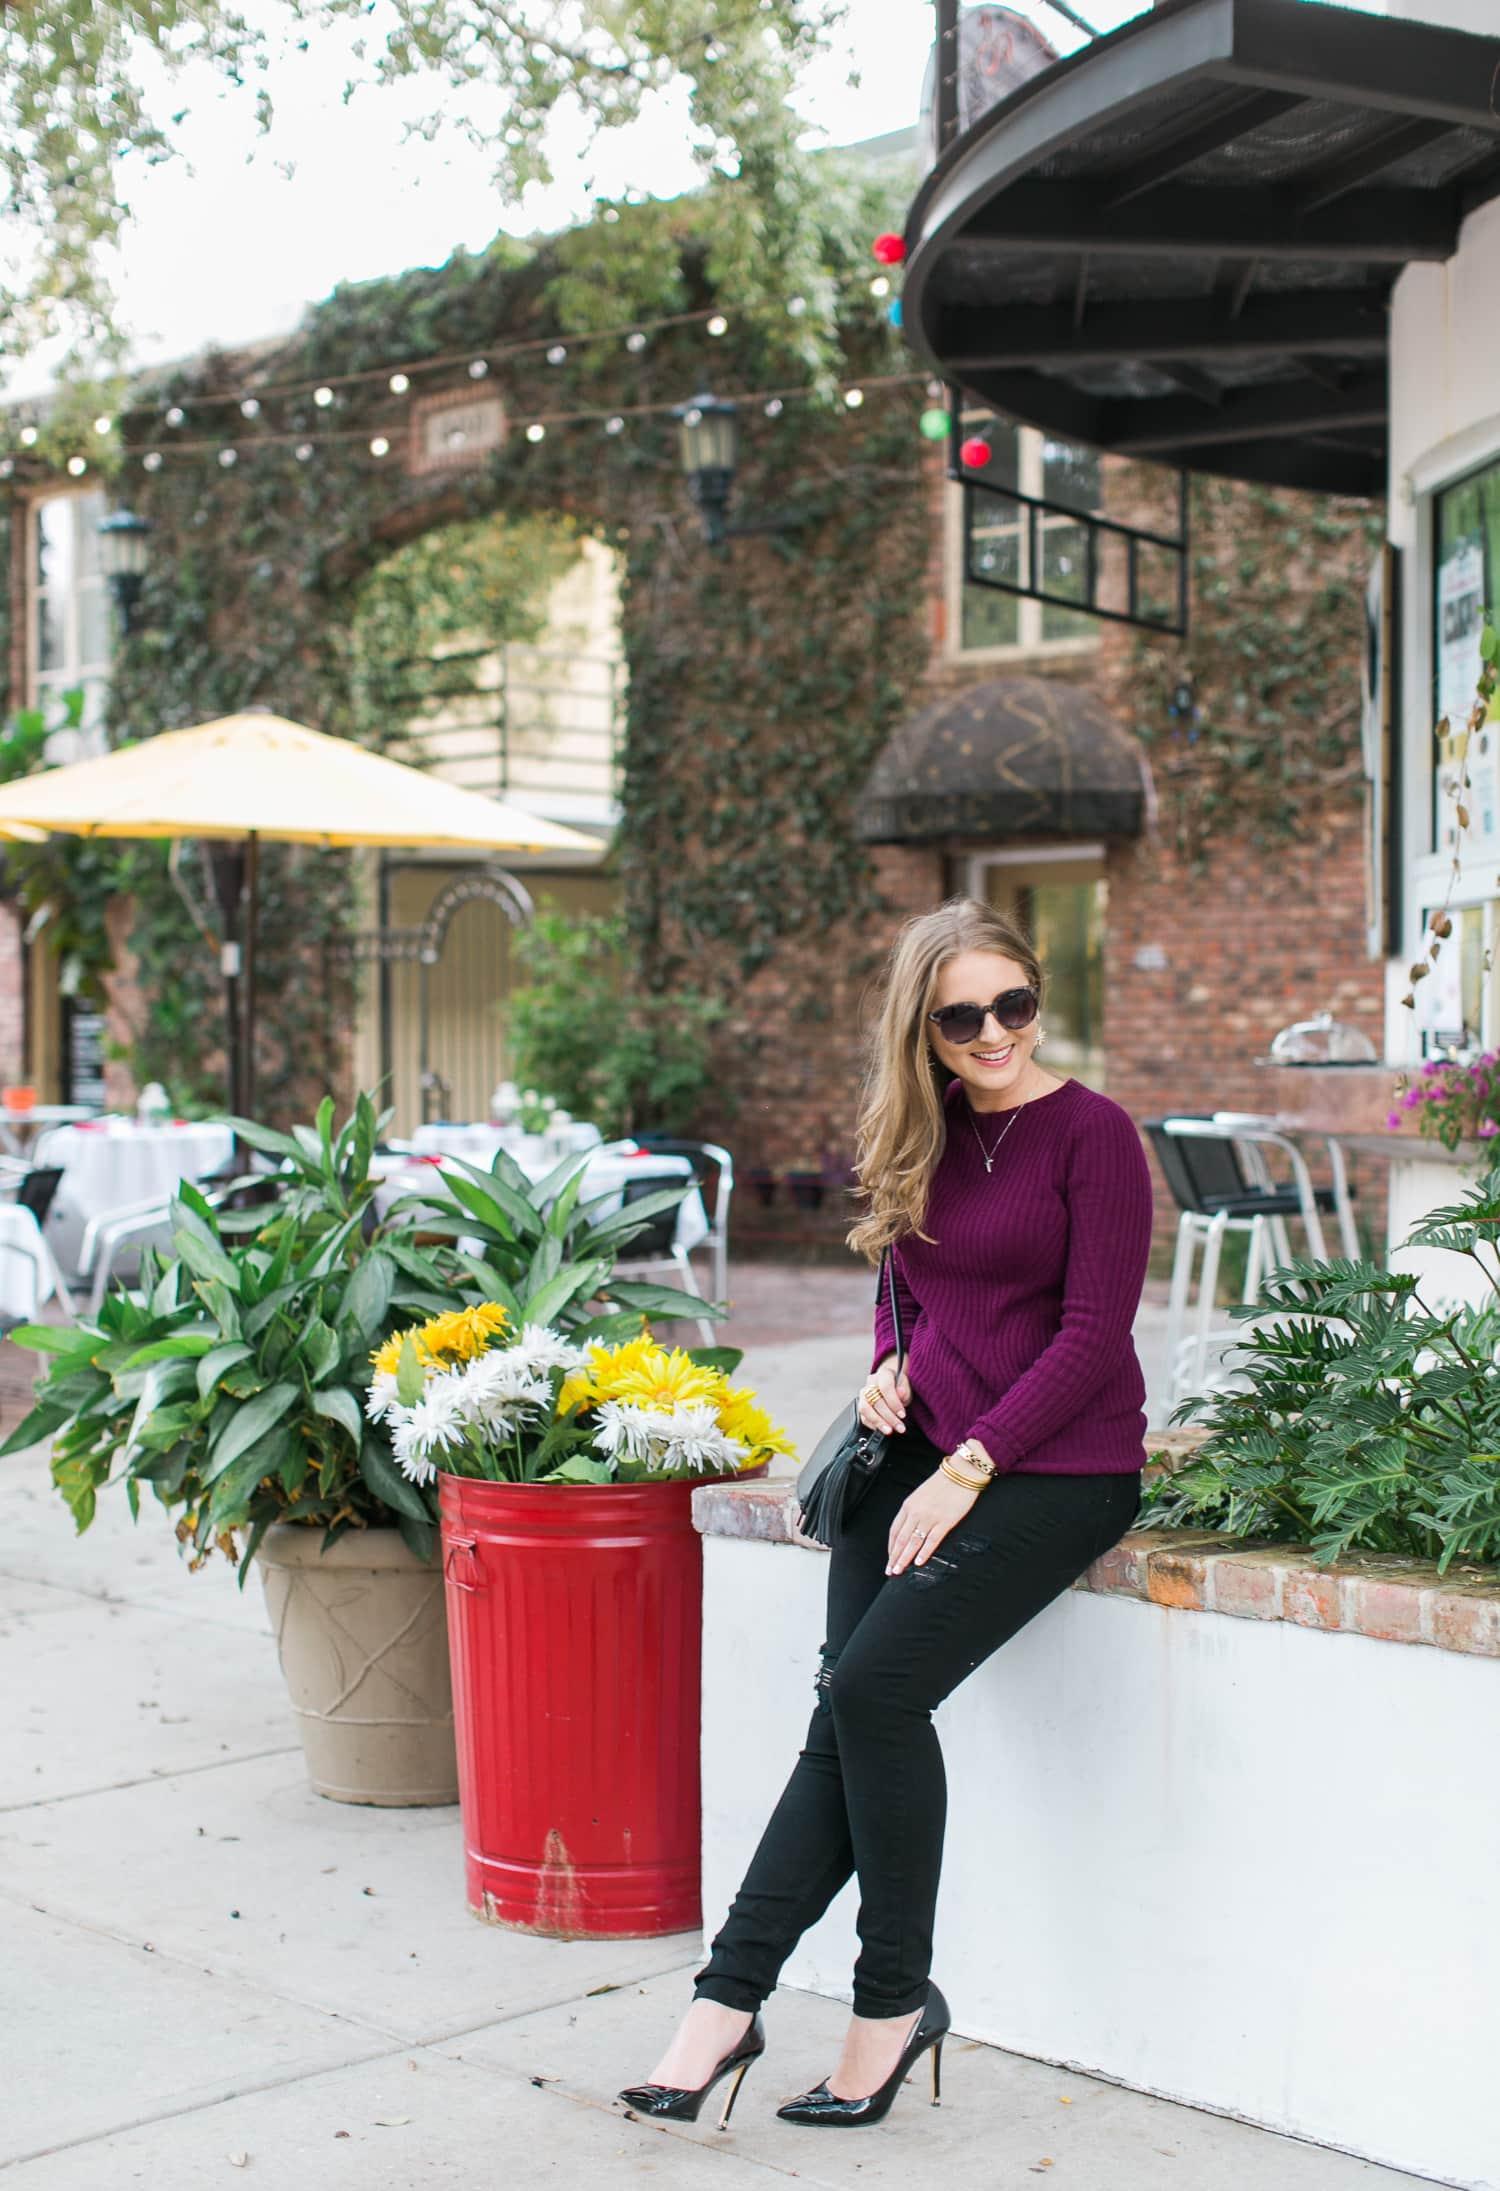 black-ripped-jeans-retro-round-sunglasses-burgundy-cashmere-sweater-black-pointy-toe-pumps-tassel-handbag-ashley-brooke-nicholas-046